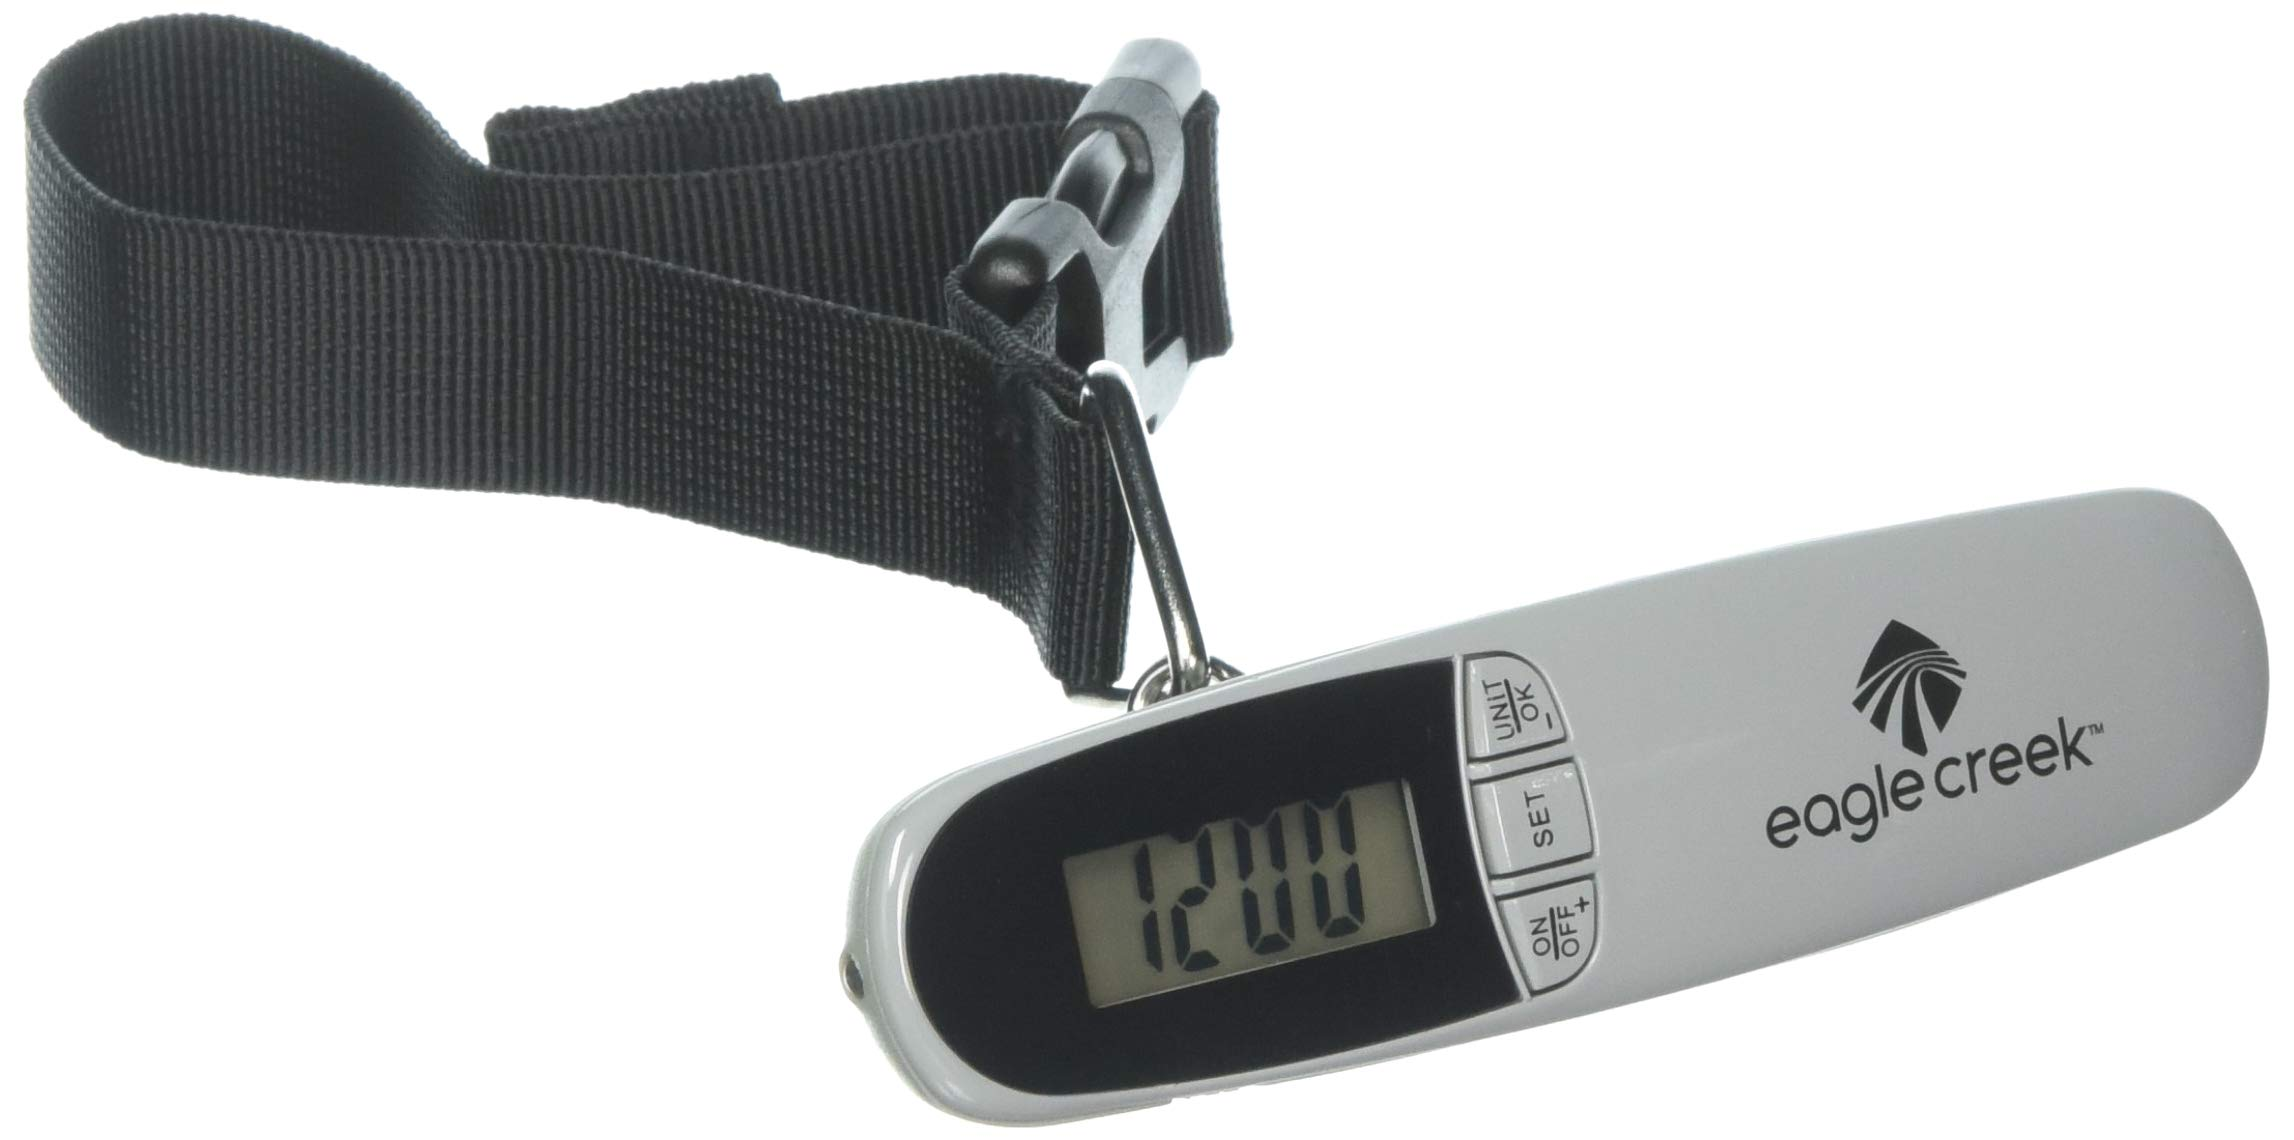 Eagle Creek Luggage Scale/Alarm Clock, CHARCOAL